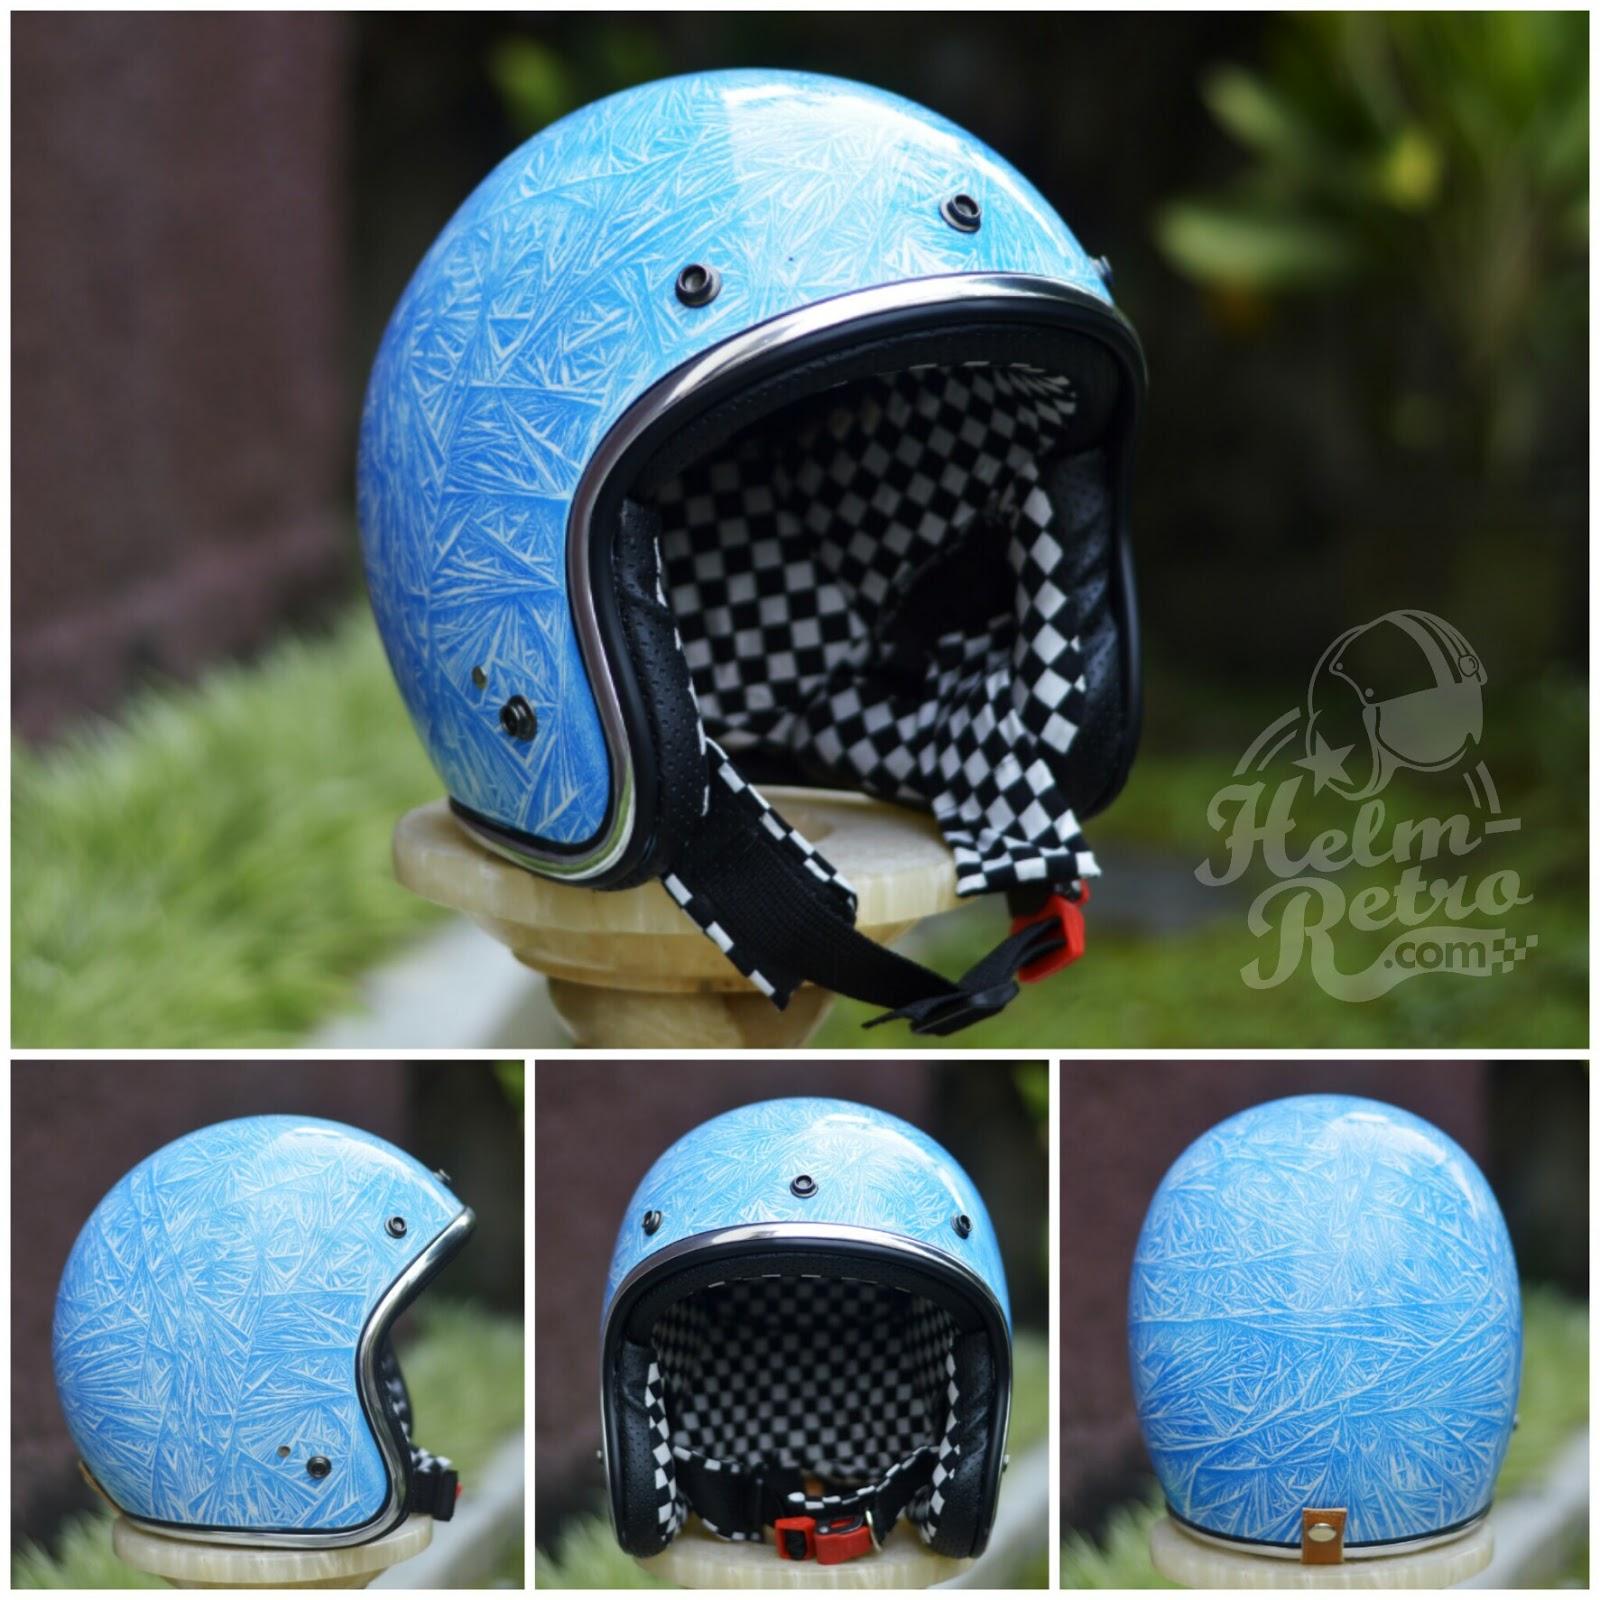 Helm Retro - Helm Retro Pilot - Helm Retro Bogo: Helm